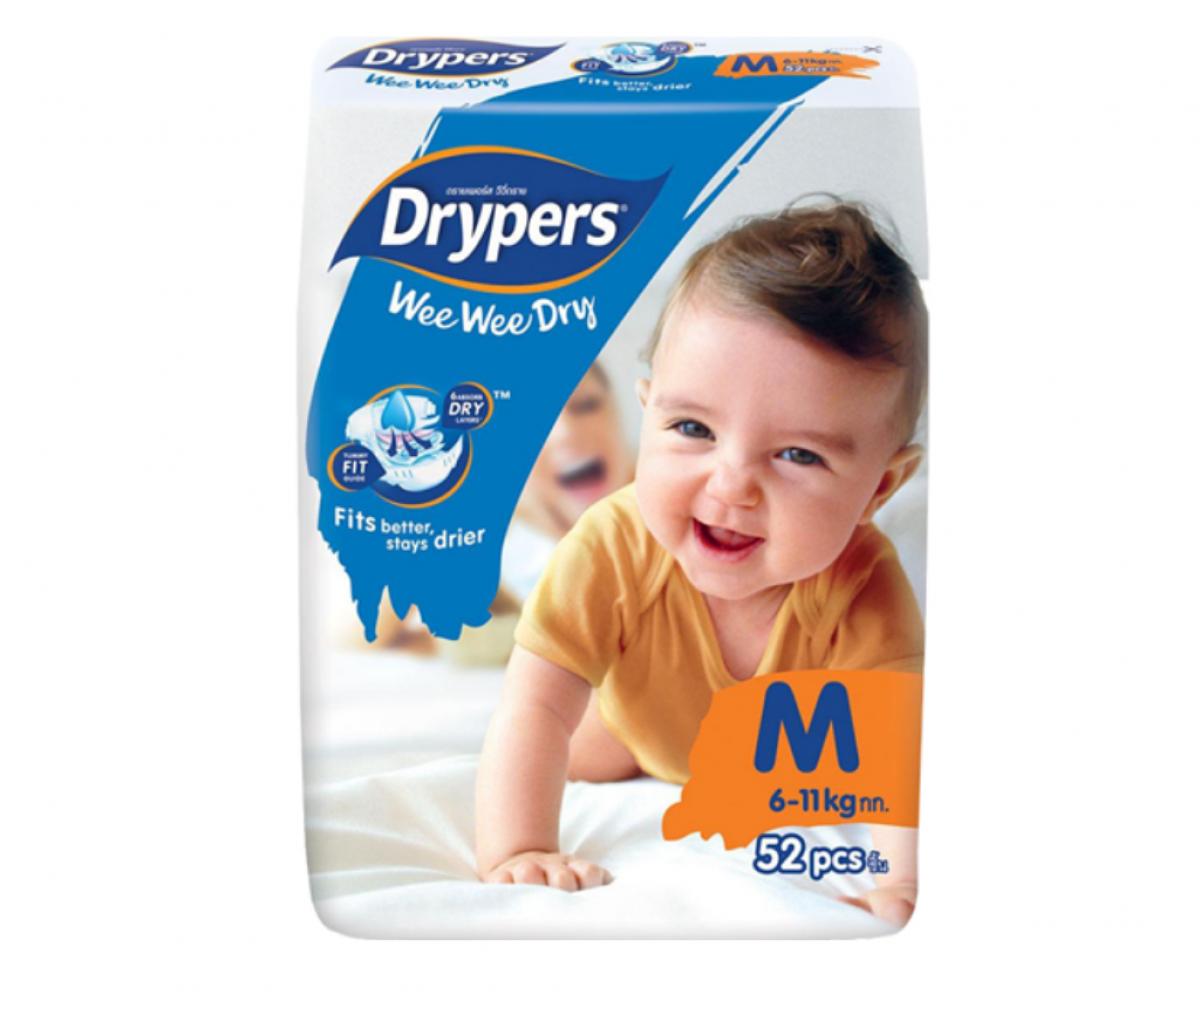 Drypers Baby Diaper (M)